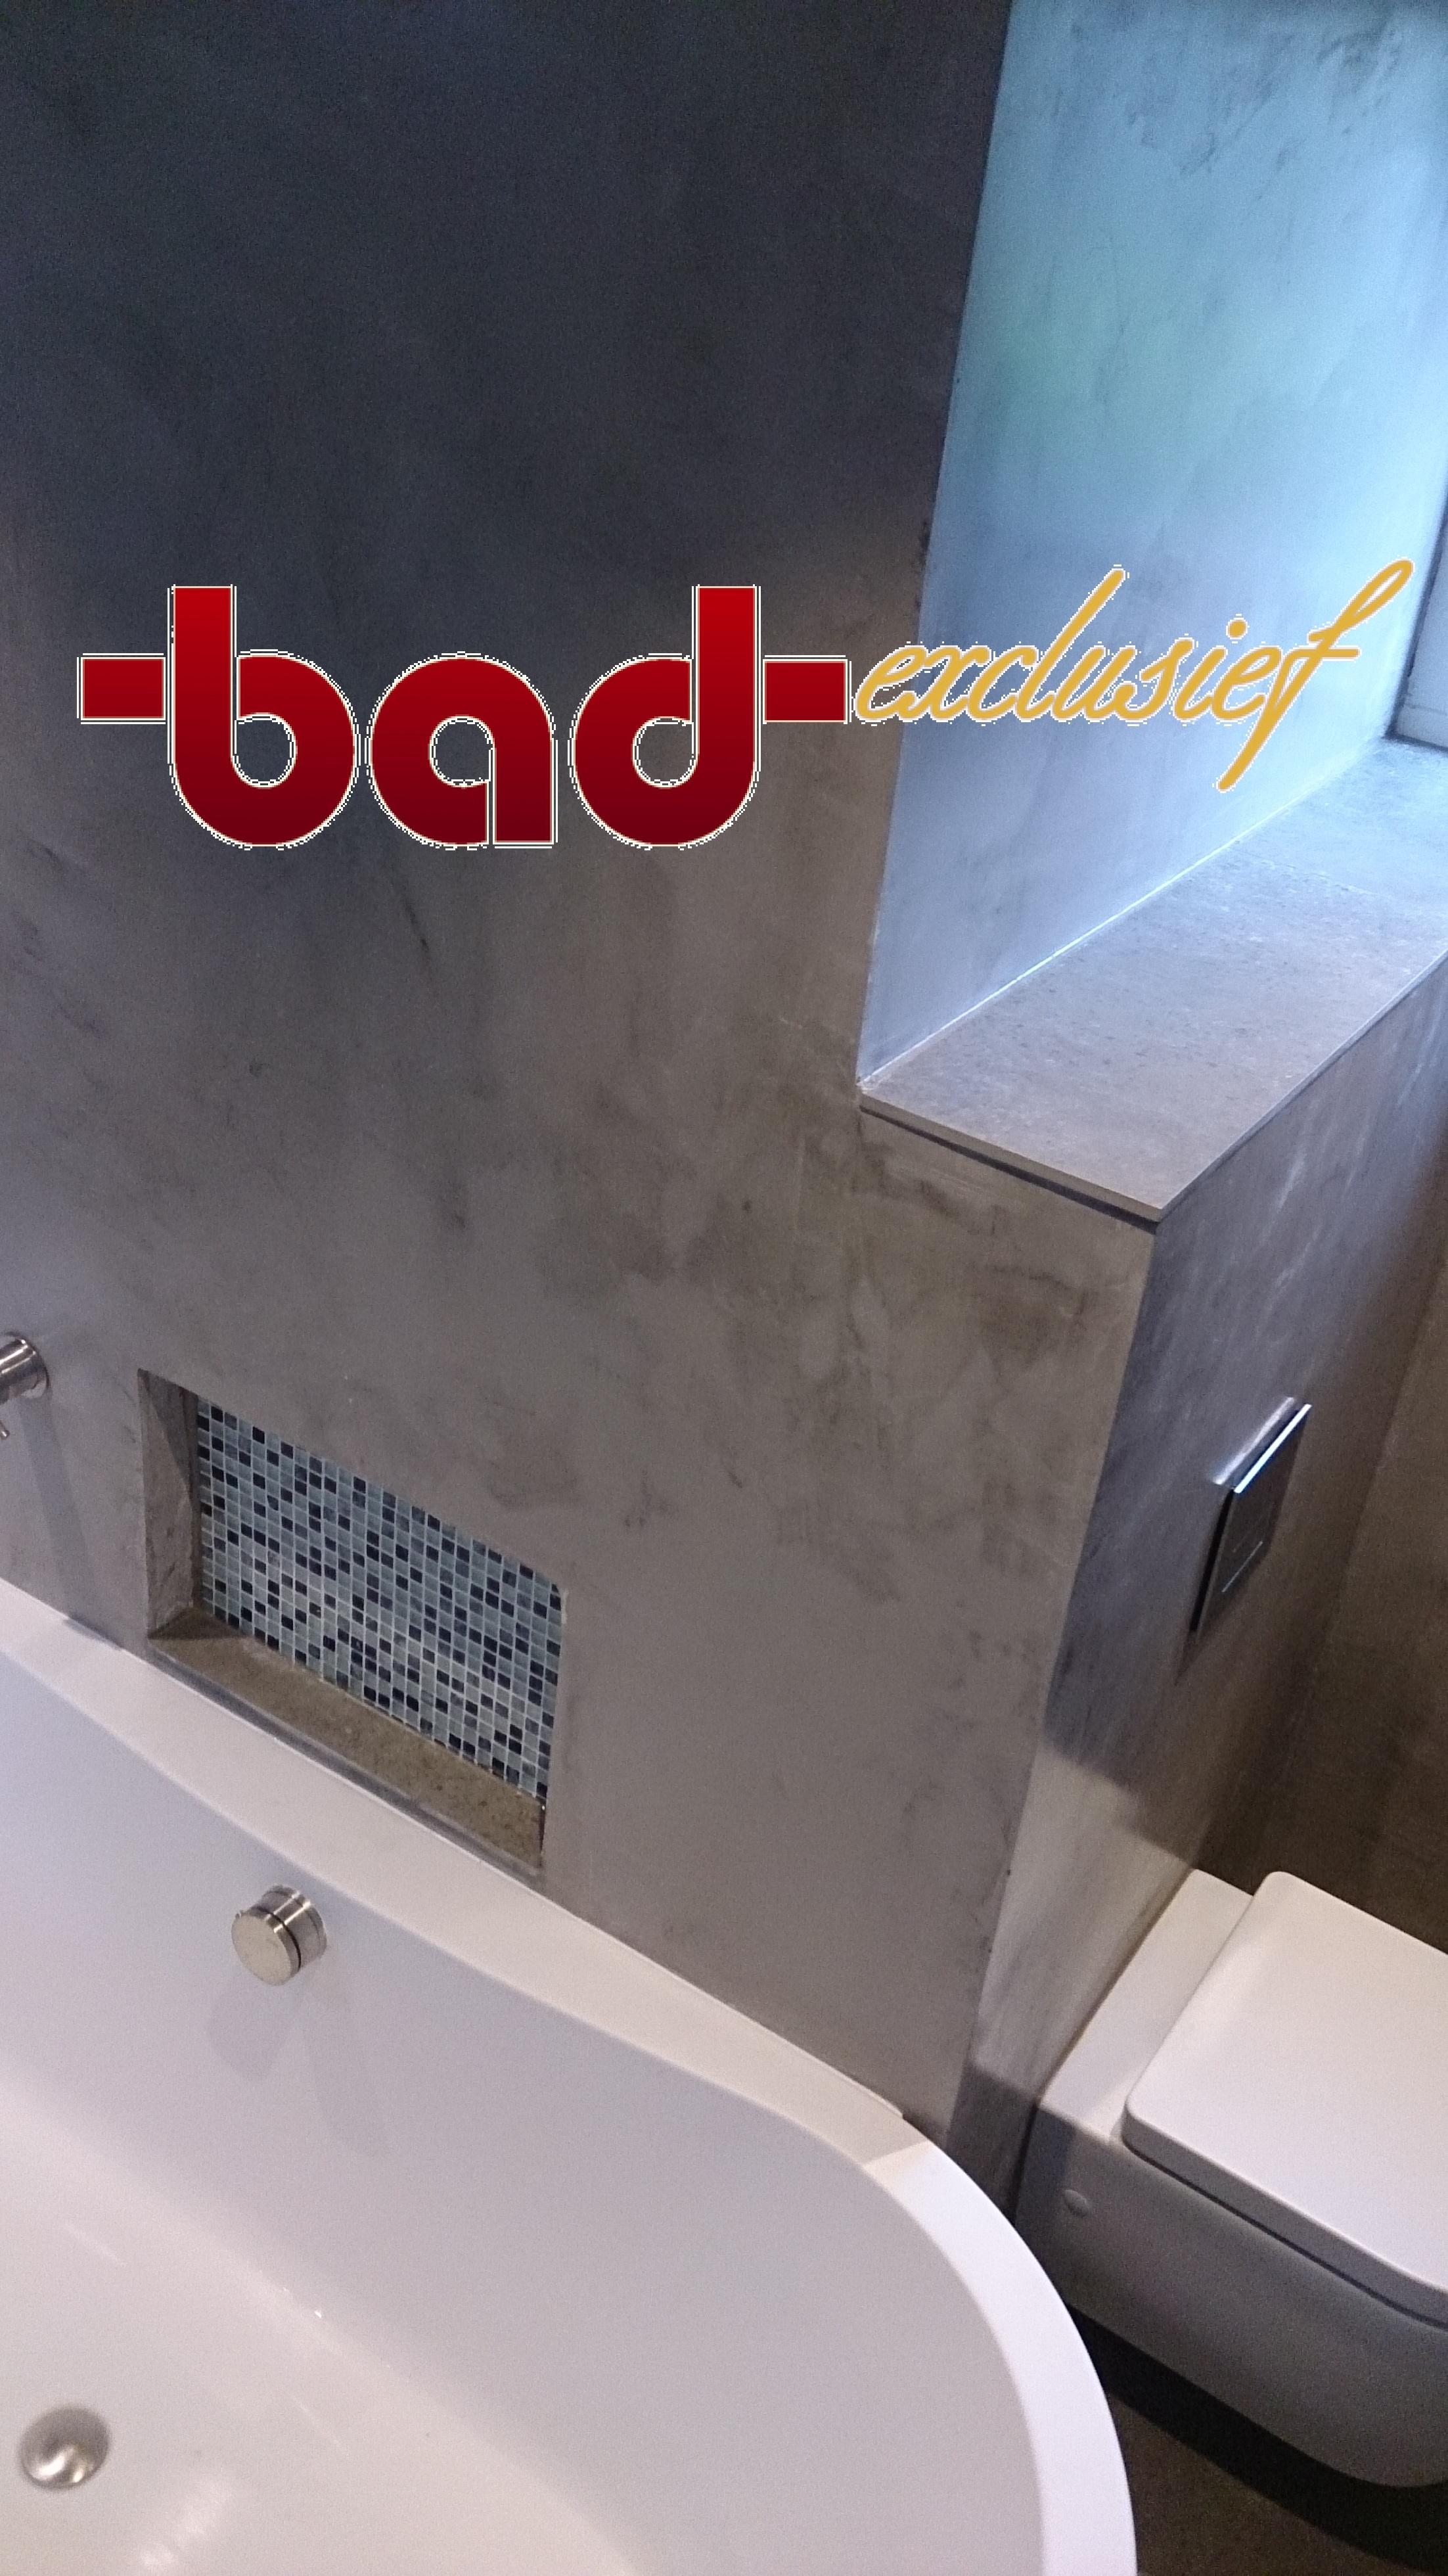 badkamerarchitect badexclusief luxe badkamer kwaliteit